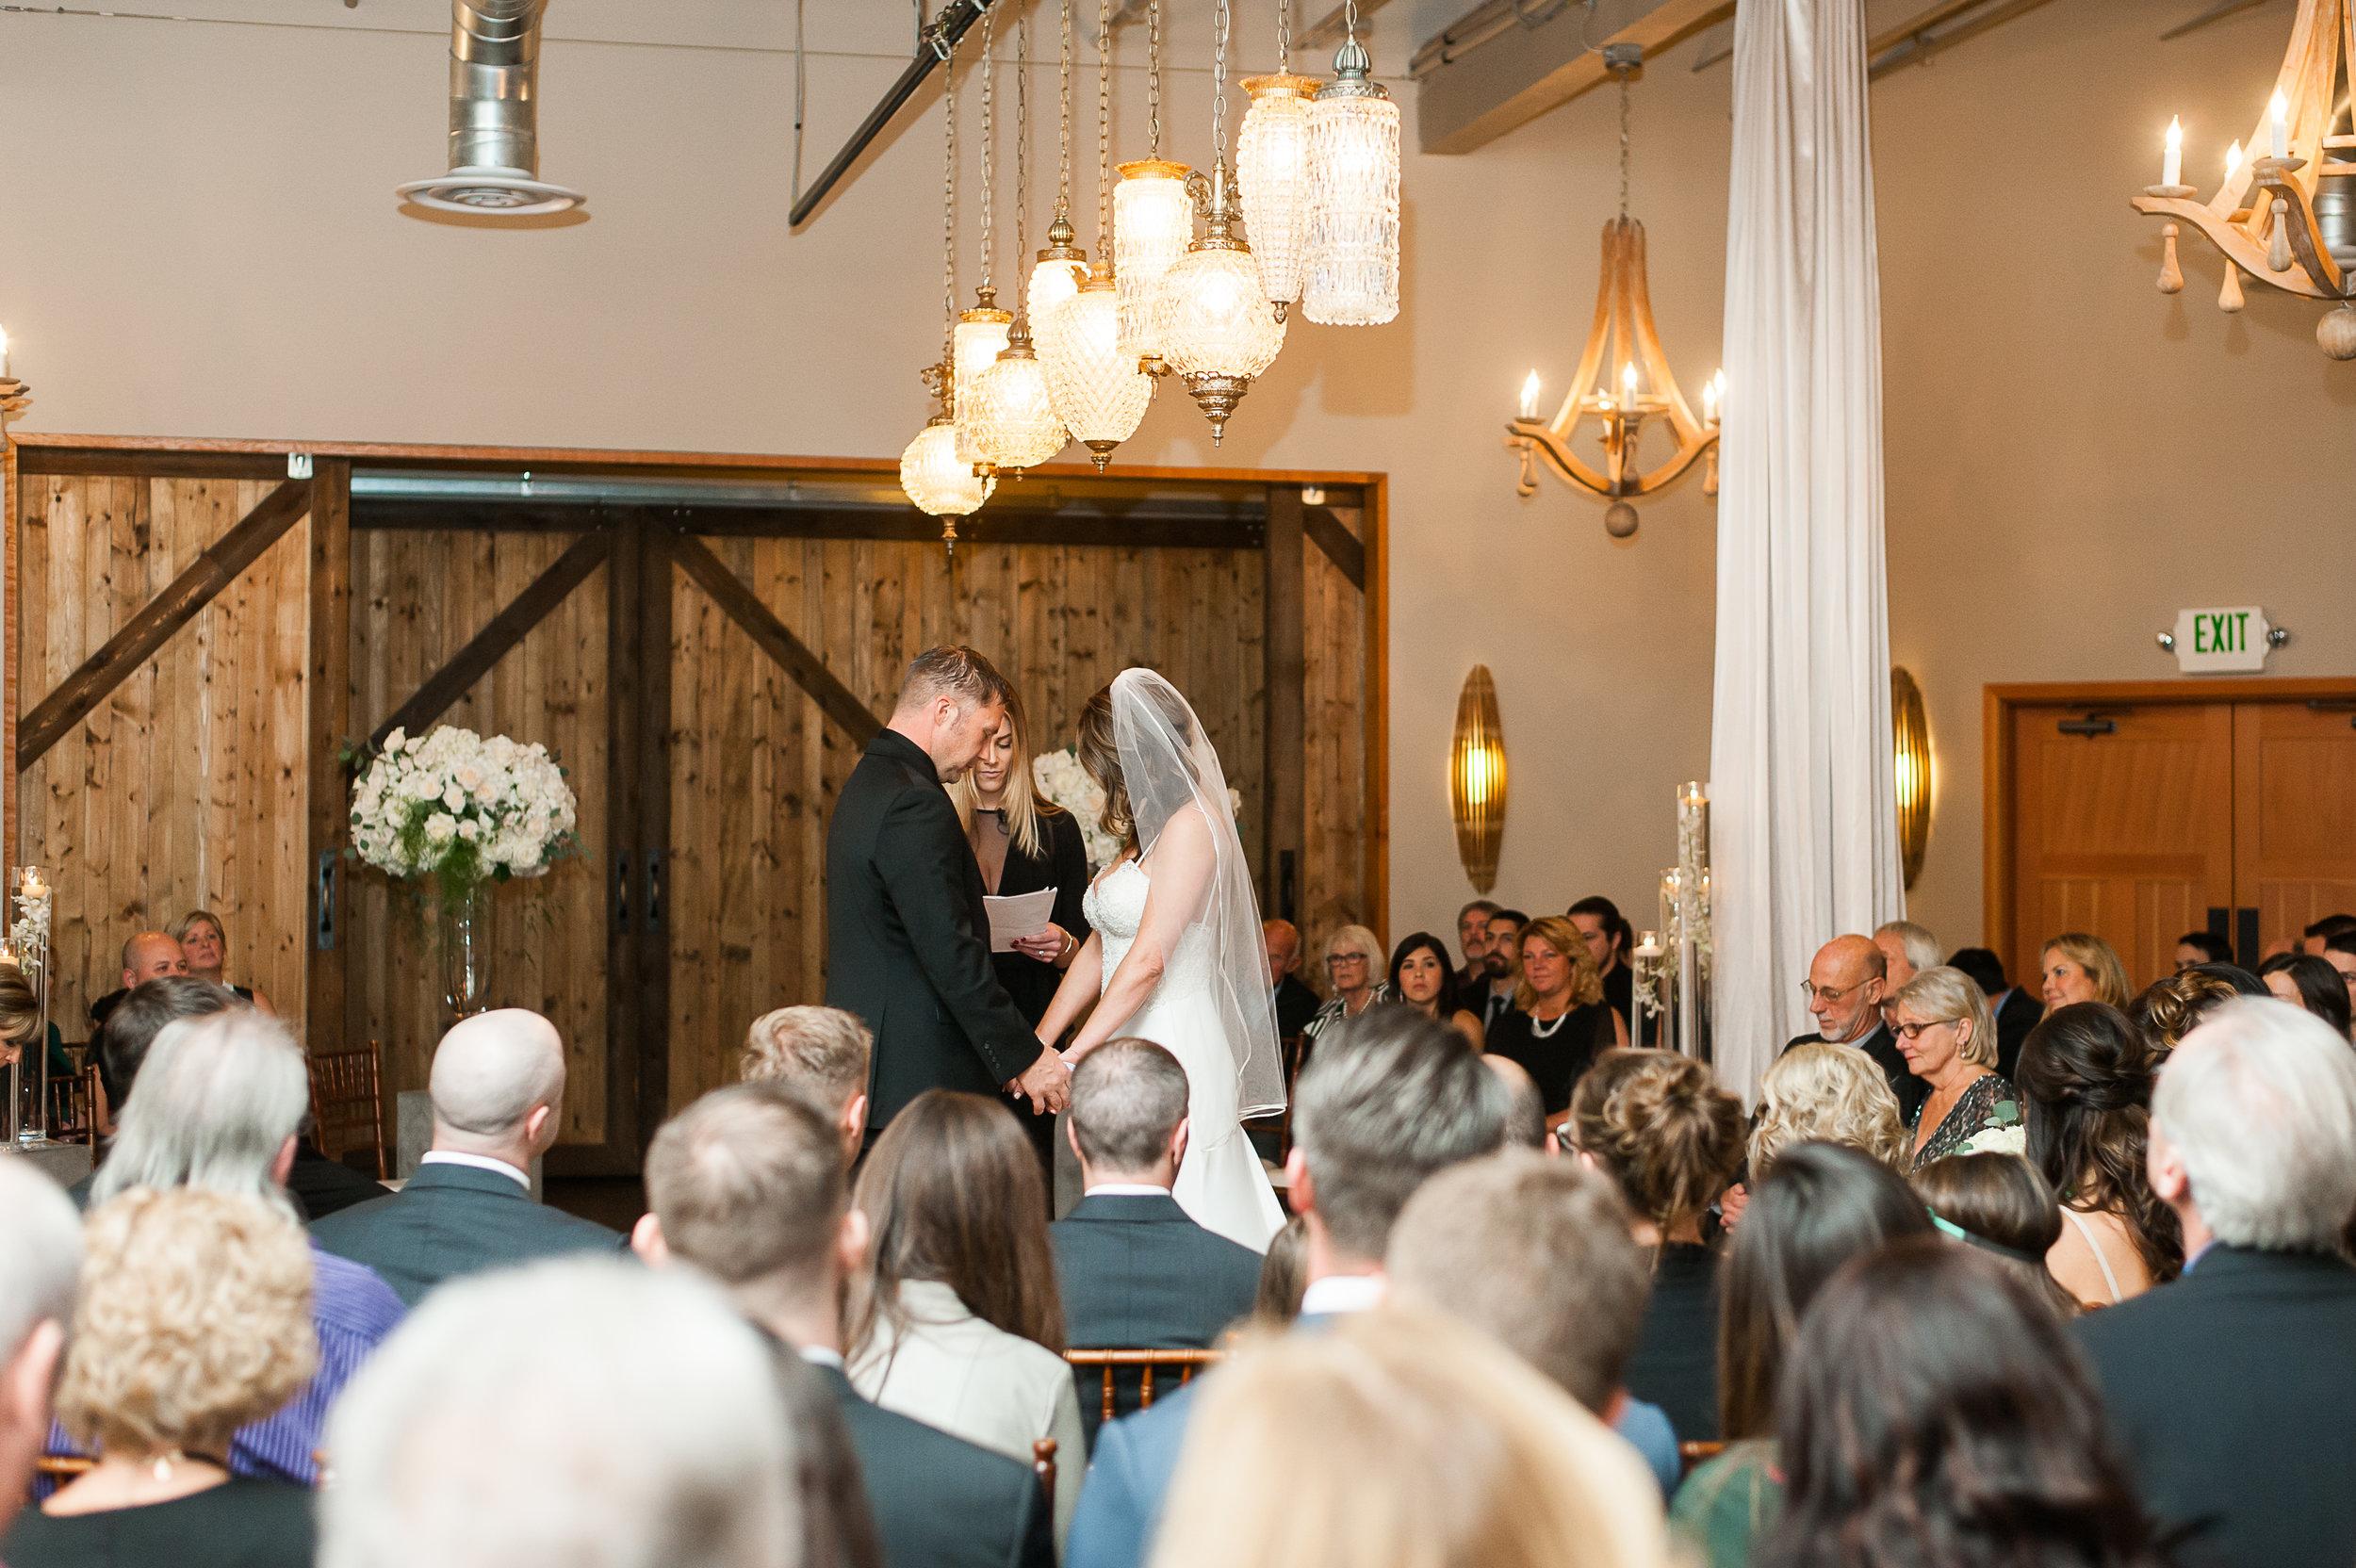 JJ-wedding-Van-Wyhe-Photography-370.jpg